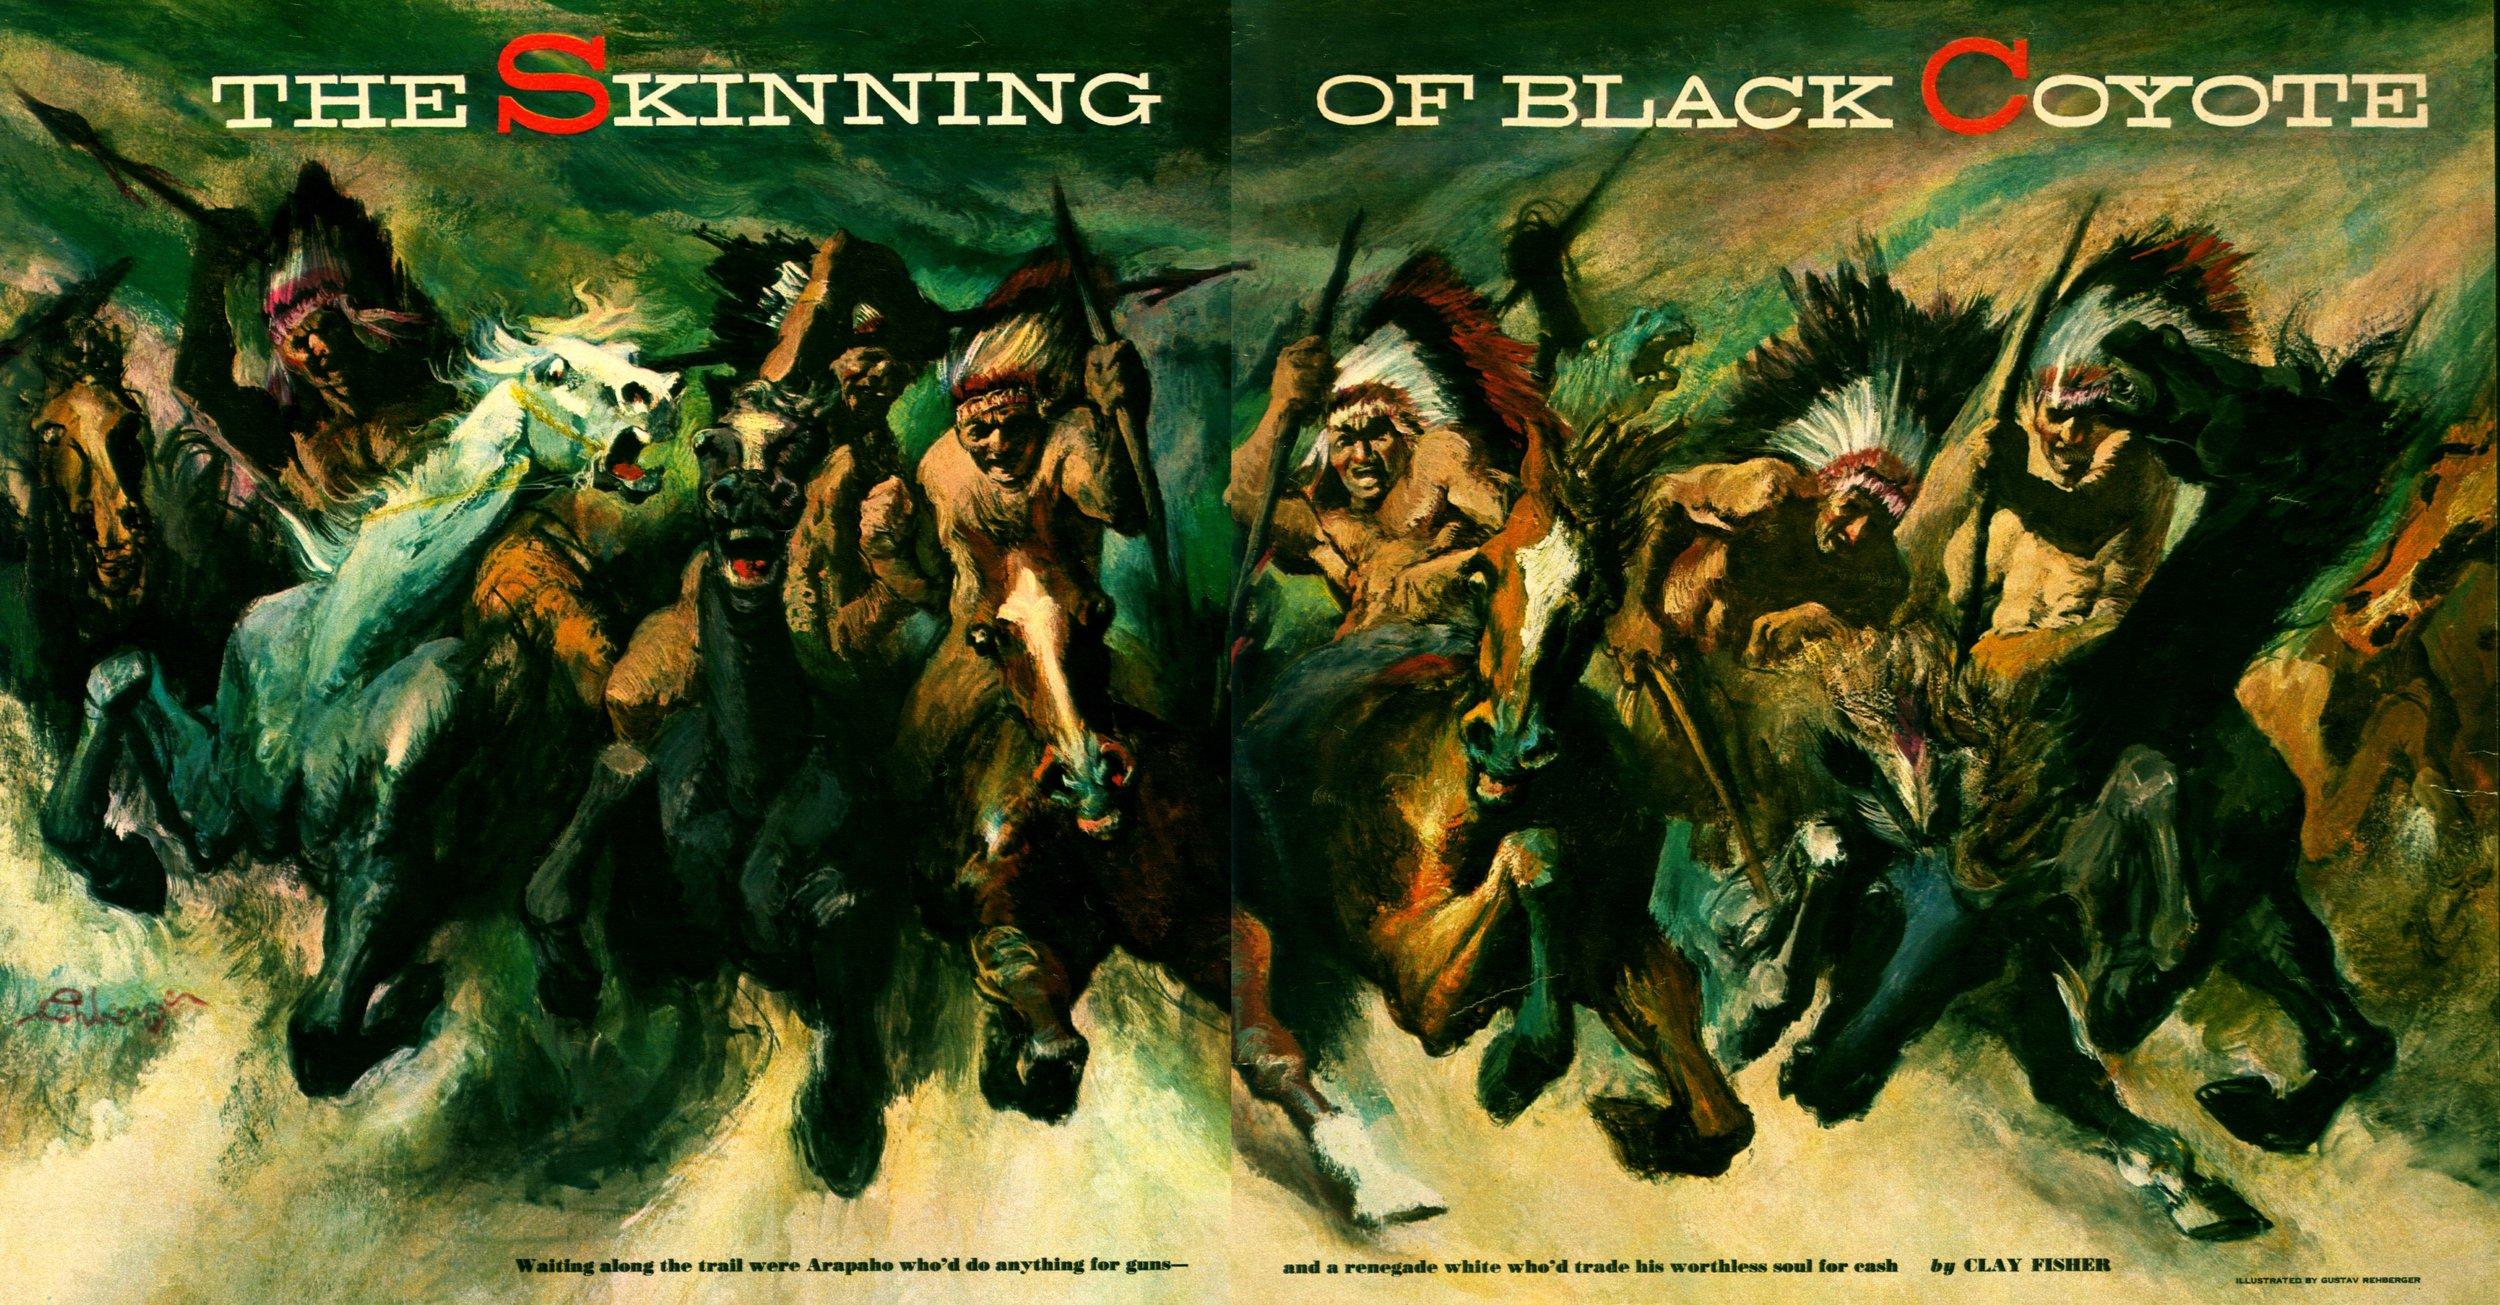 November 1951 - The Skinning of Black Coyote